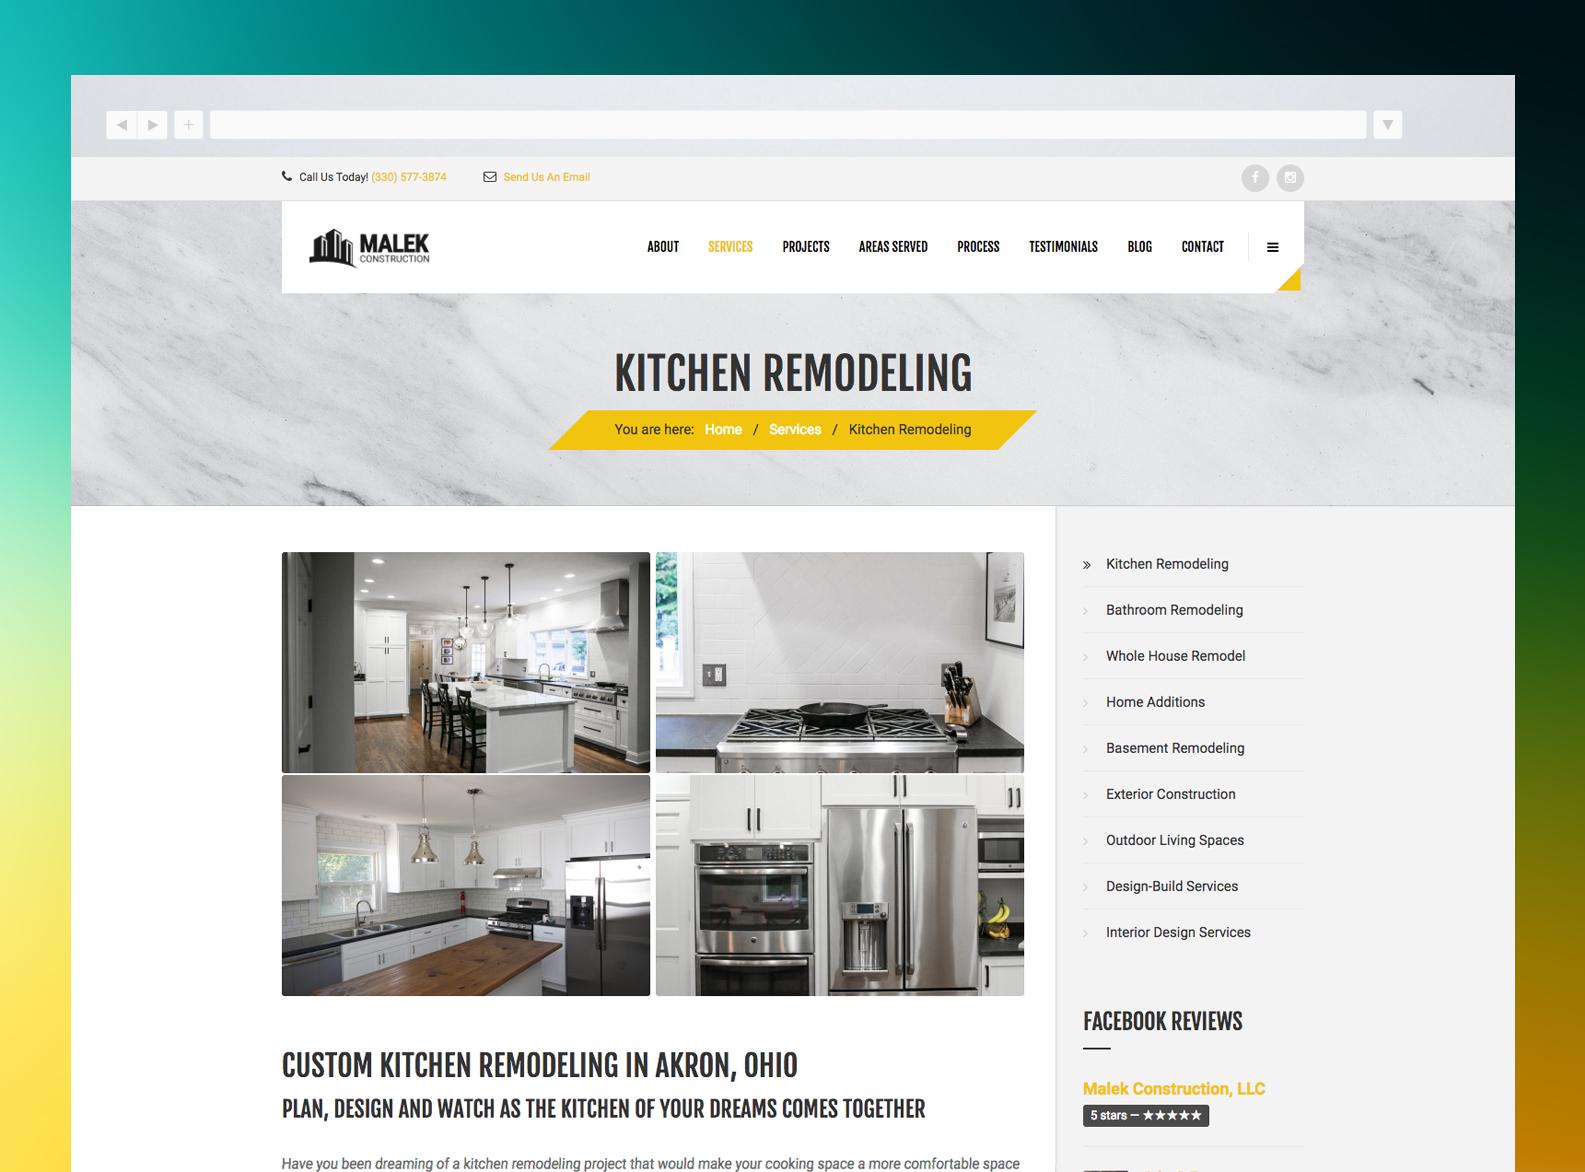 Malek Construction Website Services